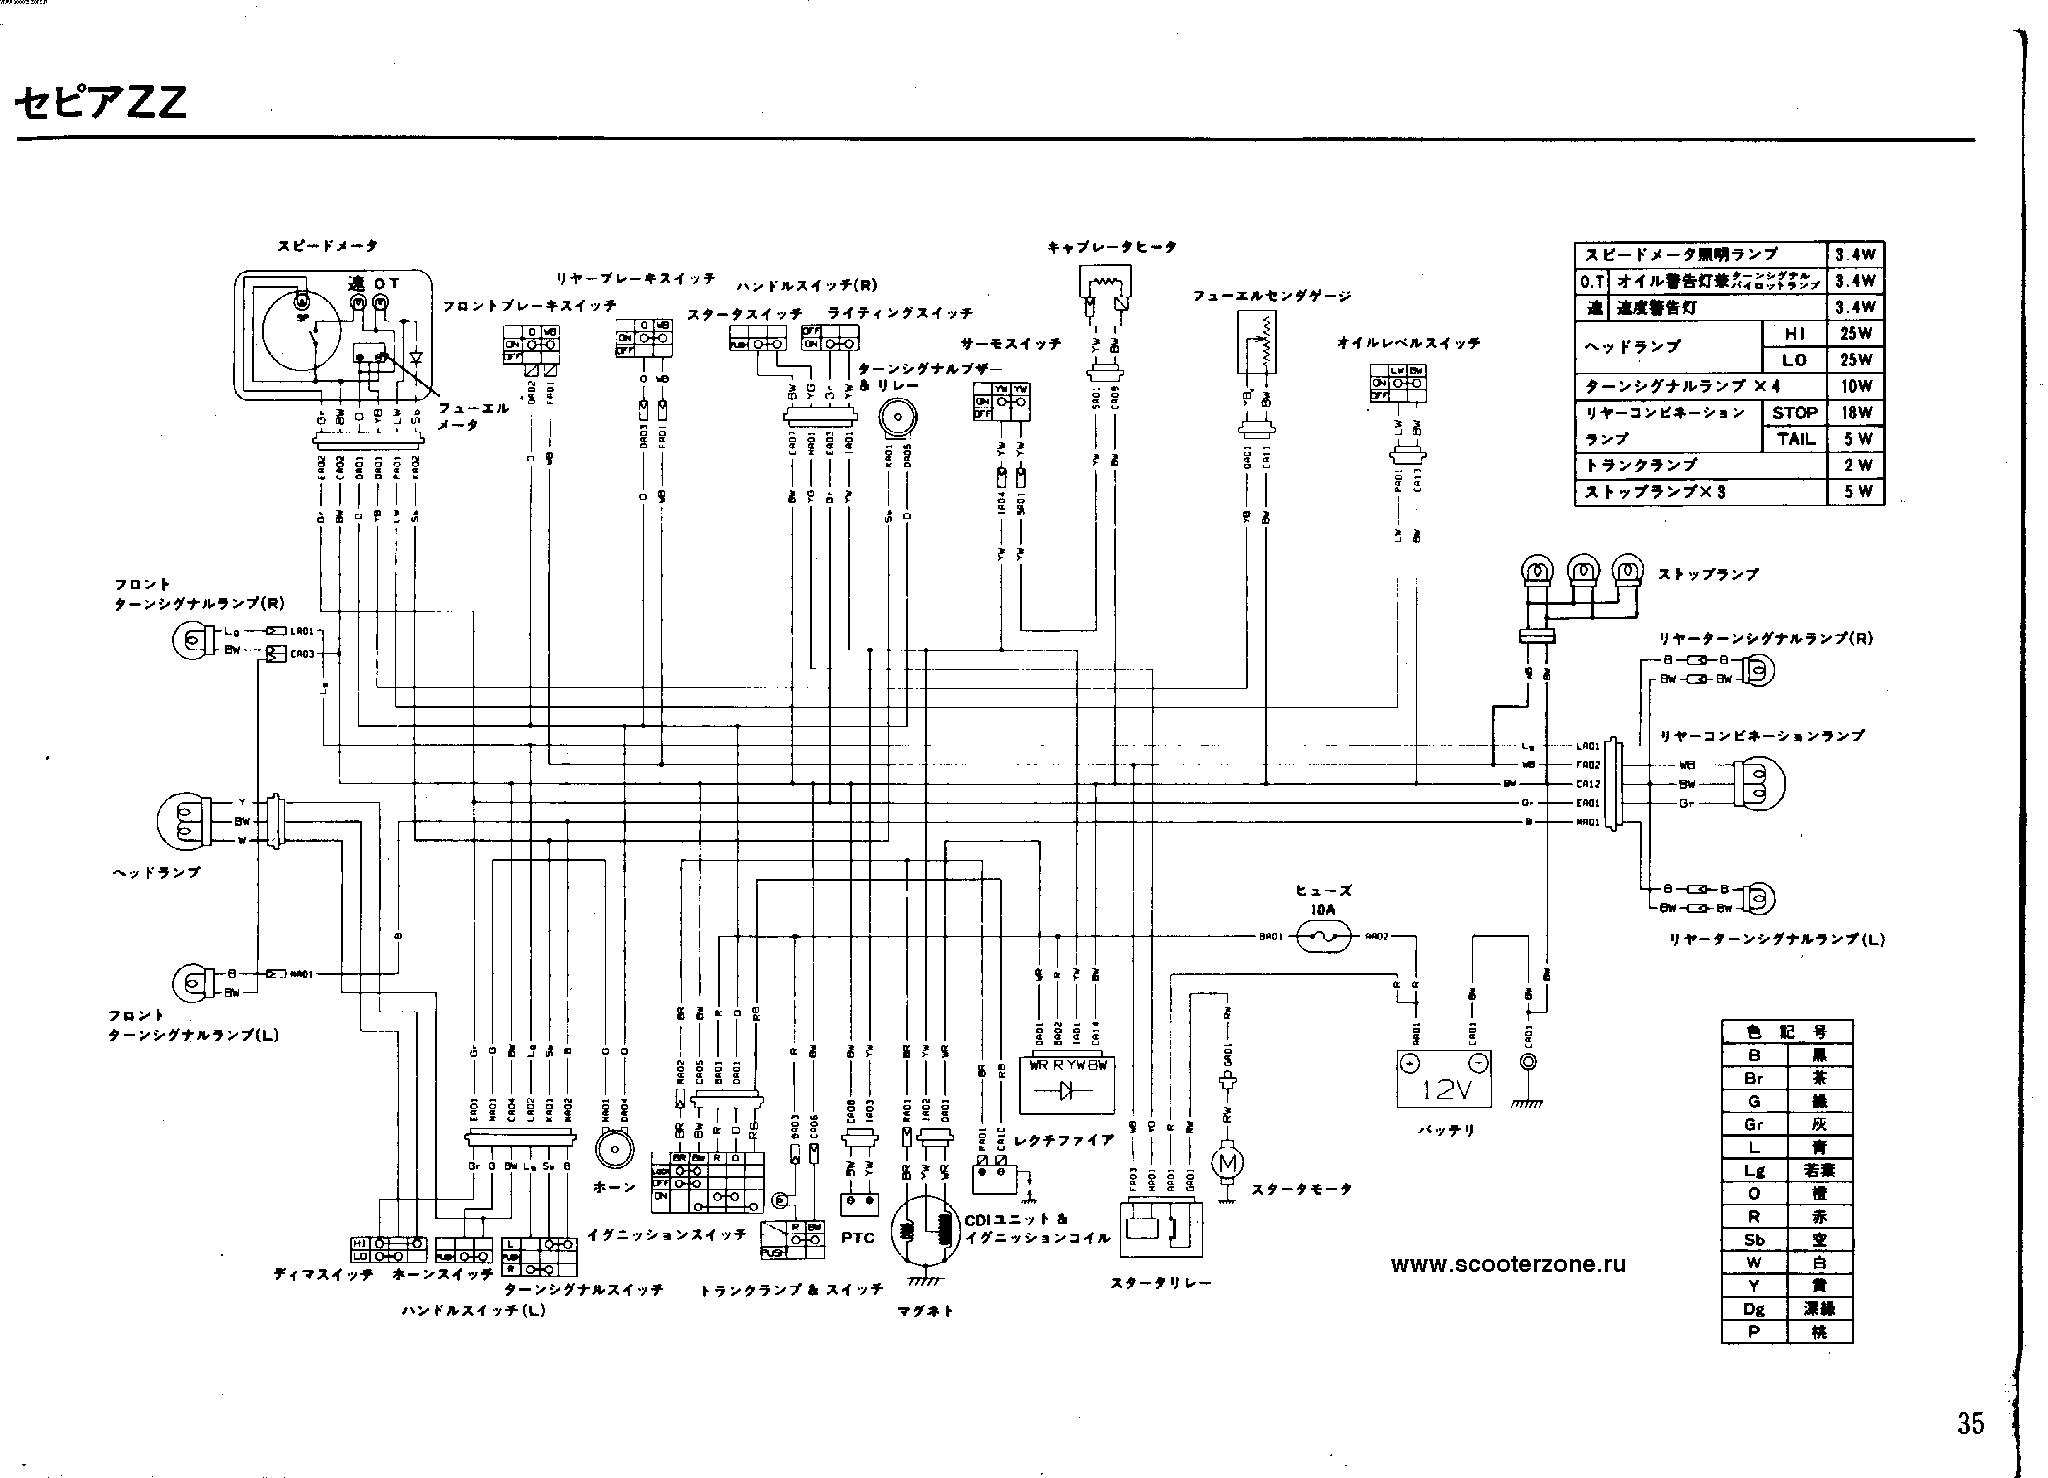 Схема электрооборудования скутеров Suzuki Sepia ZZ